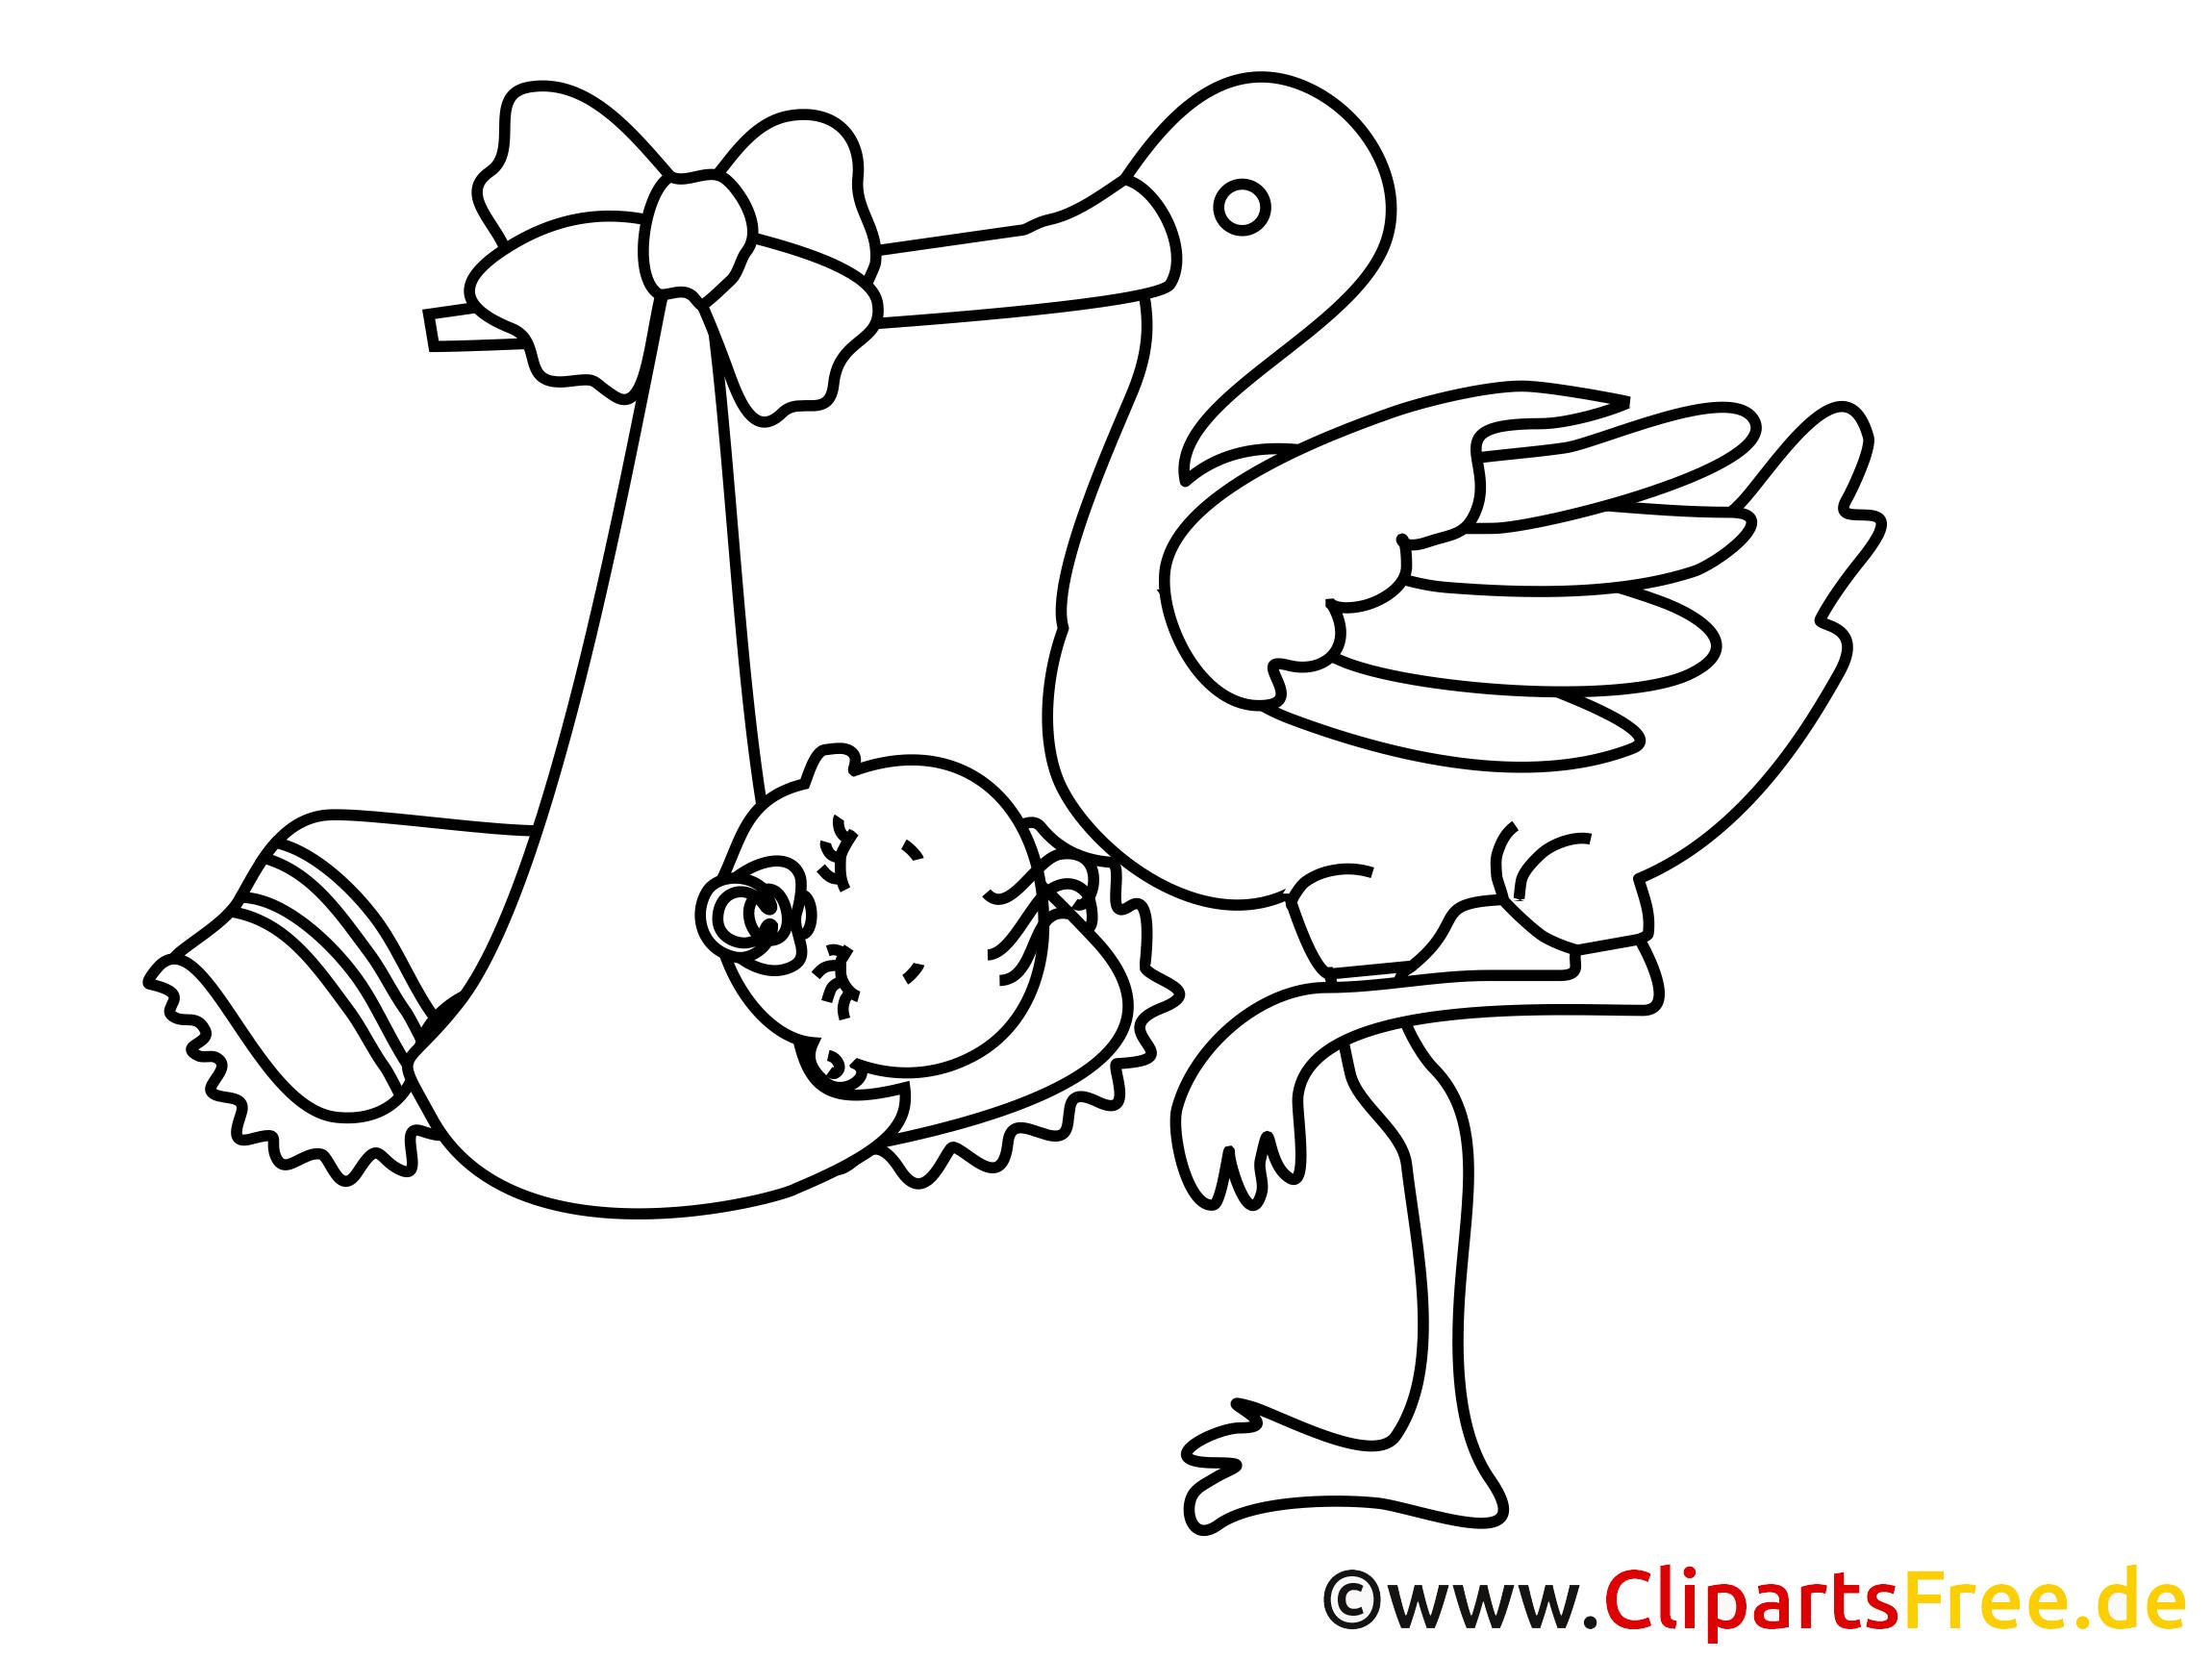 Coloriage de cigogne avec bebe mandaliser - Cigogne dessin ...